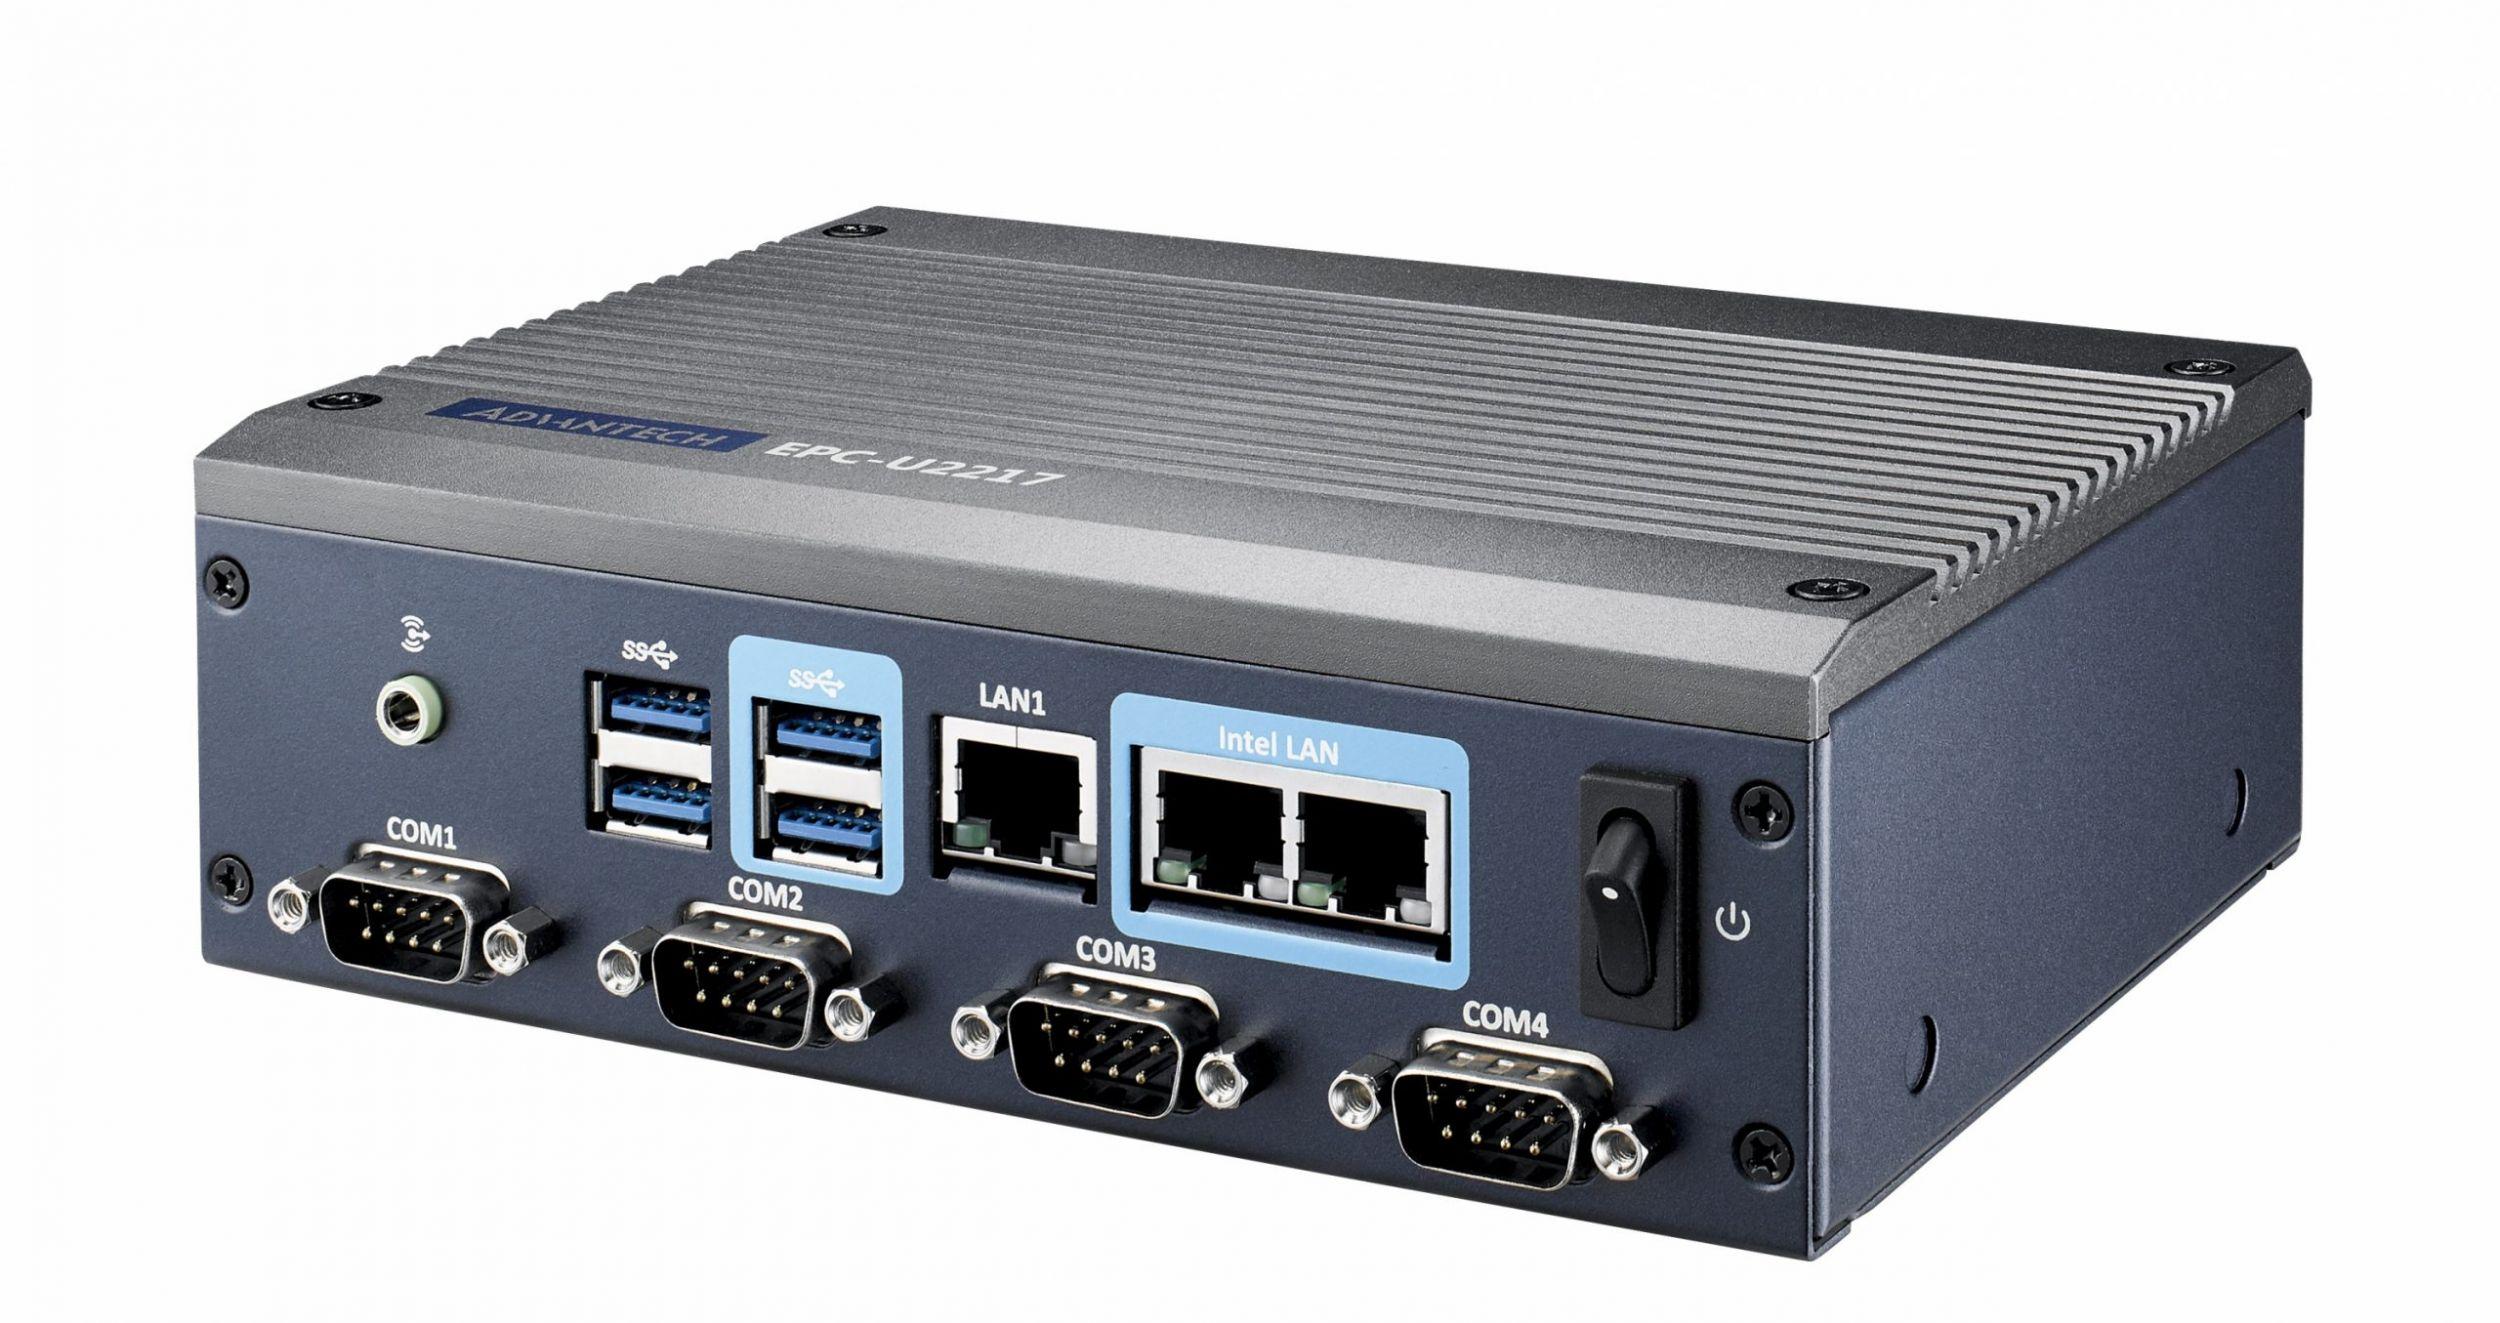 Advantech veröffentlicht kompaktes Embedded System